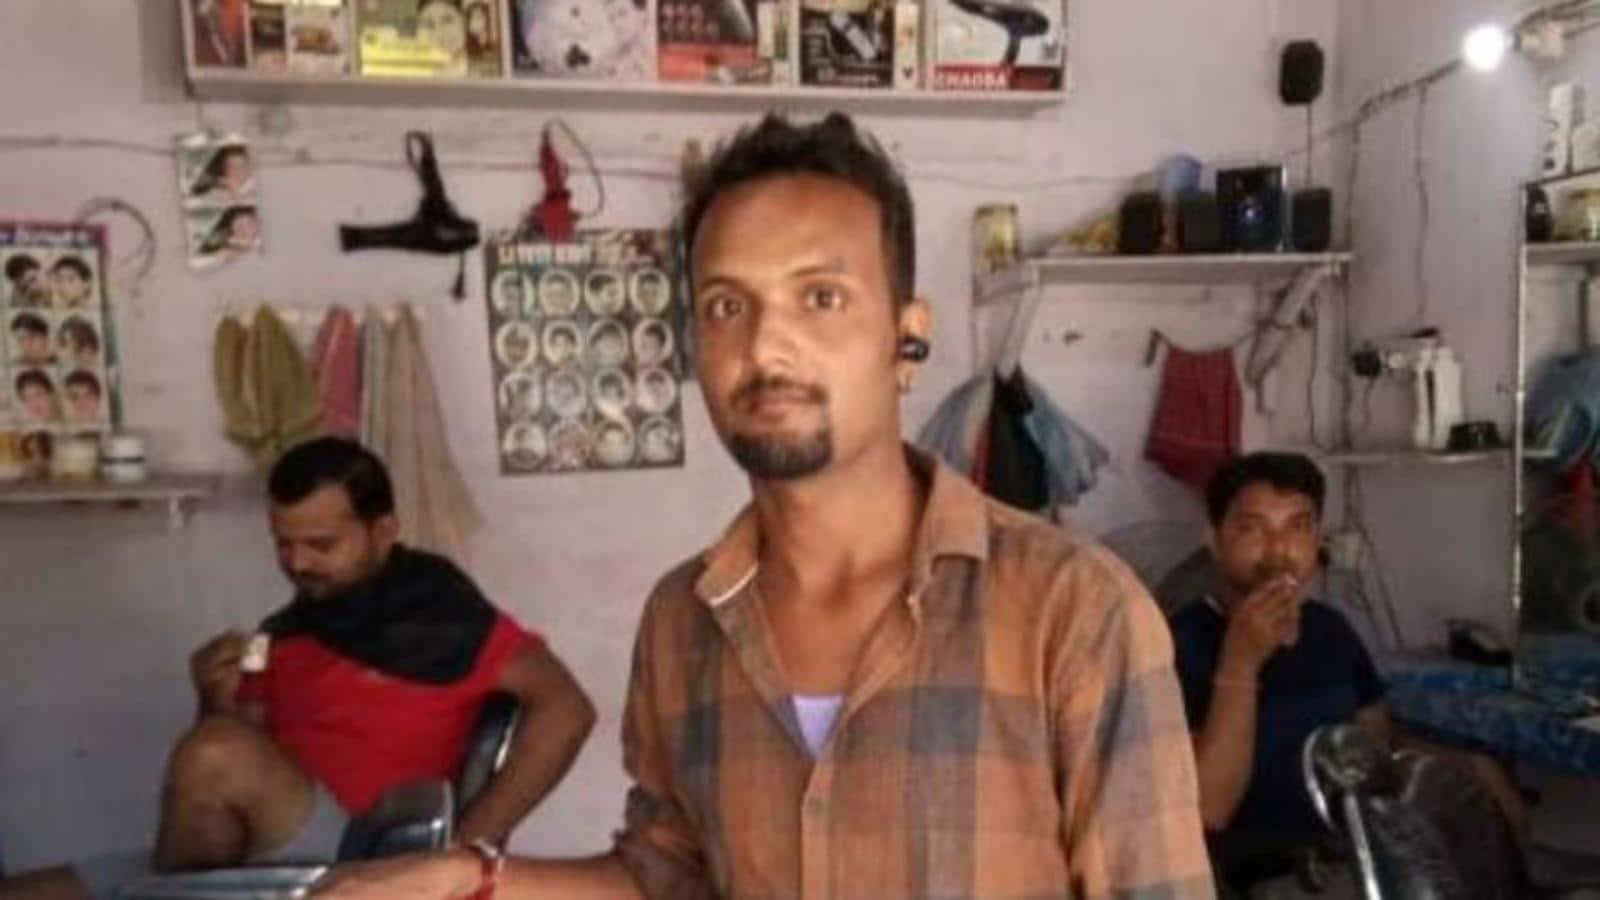 IPL: Madhubani barber wins ₹1 crore in fantasy contest - Hindustan Times